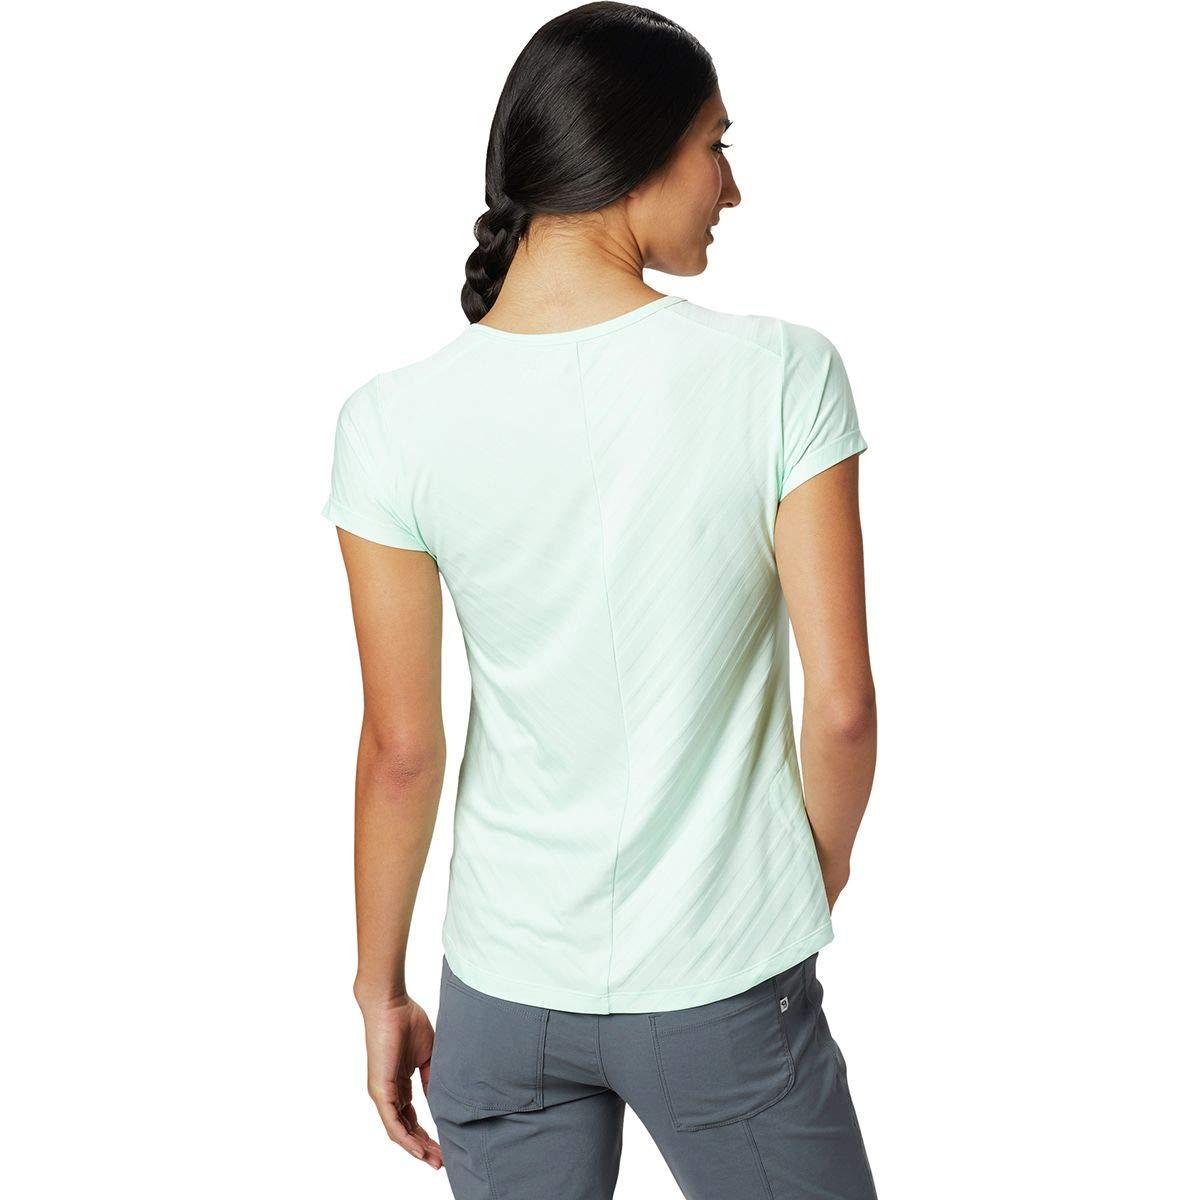 407b57df0811 Mountain Hardwear Mighty Stripe Short-Sleeve T-Shirt - Women's at Amazon  Women's Clothing store: